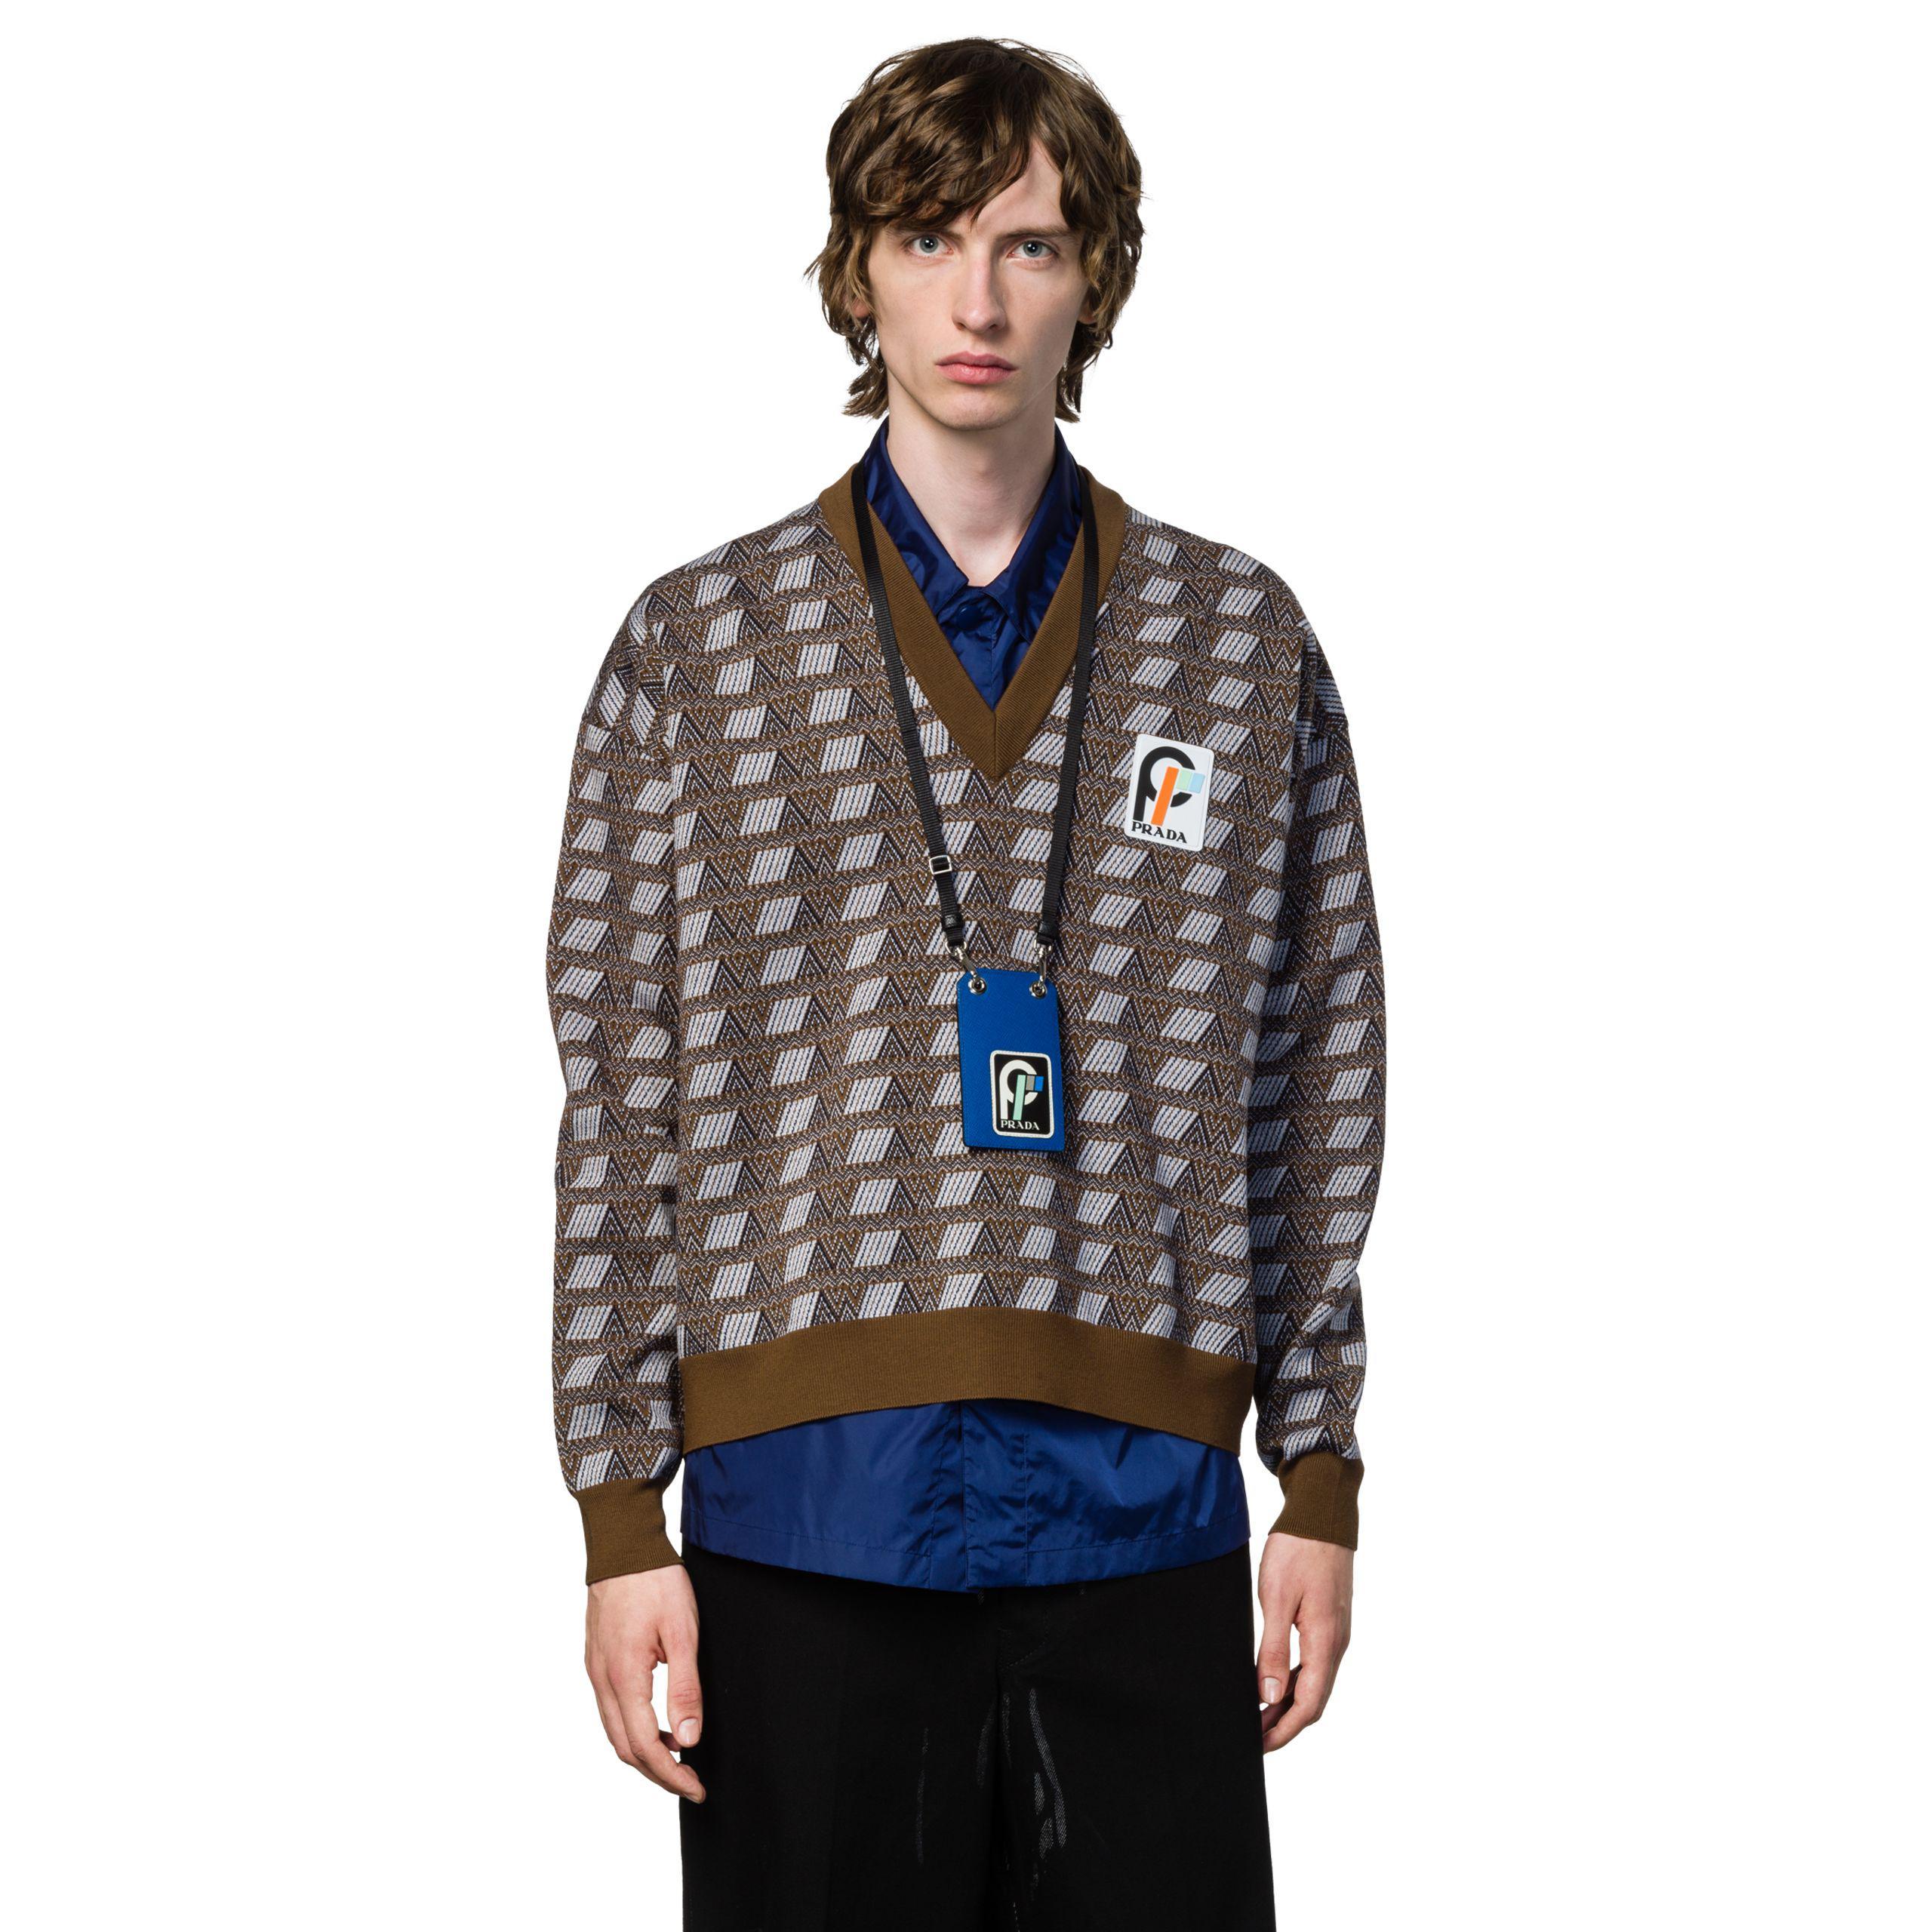 618479d9d3 Prada Blue Saffiano Leather Badge Holder for men